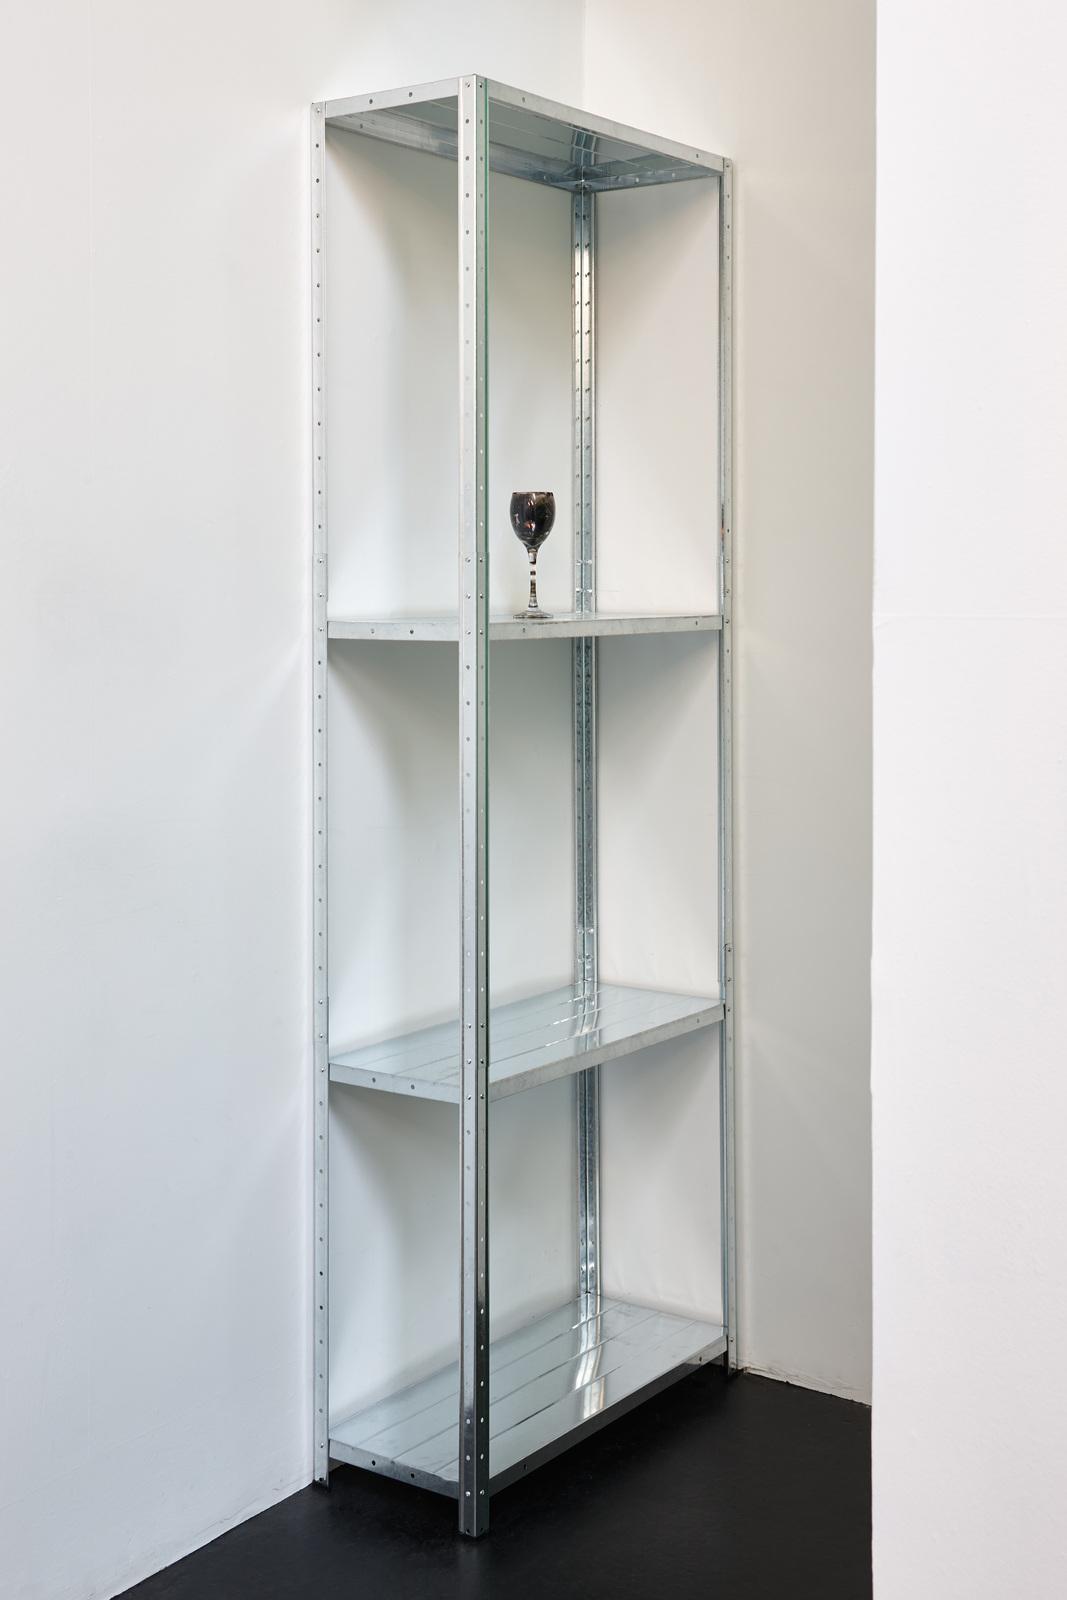 Protean Vessel(S) - Installation View VIII